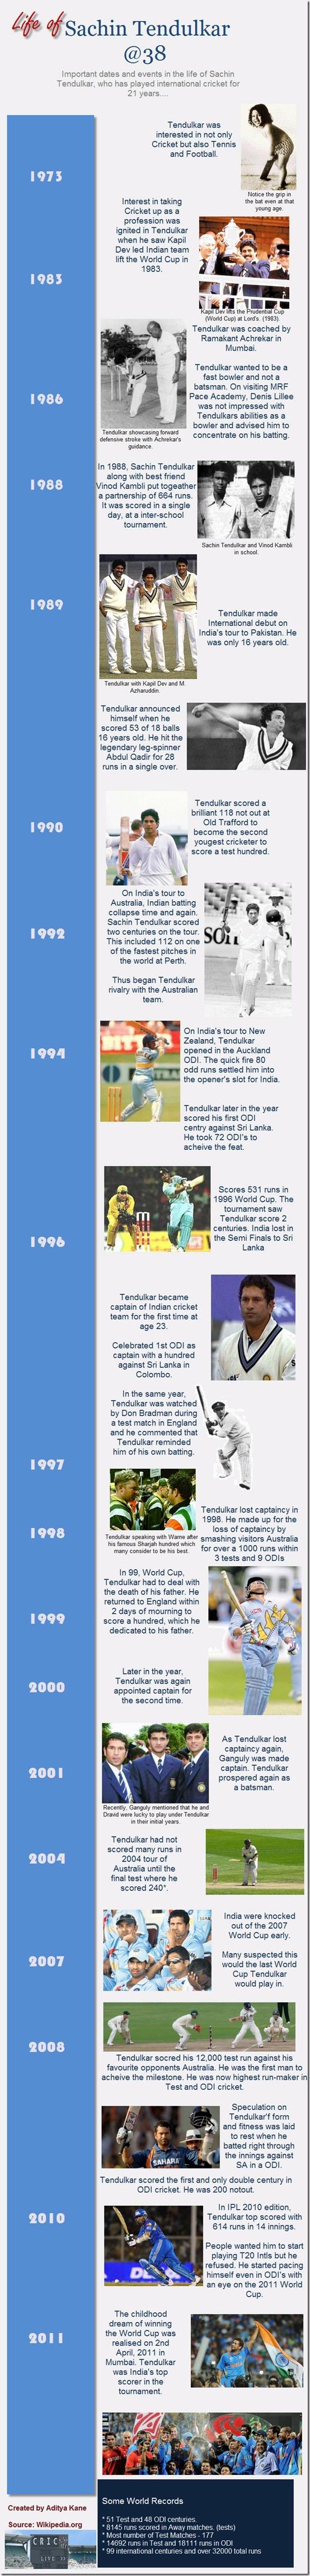 Life of Sachin Tendulkar @38 #Infographics #Sachin #Tendulkar #Life #Cricket #Sports